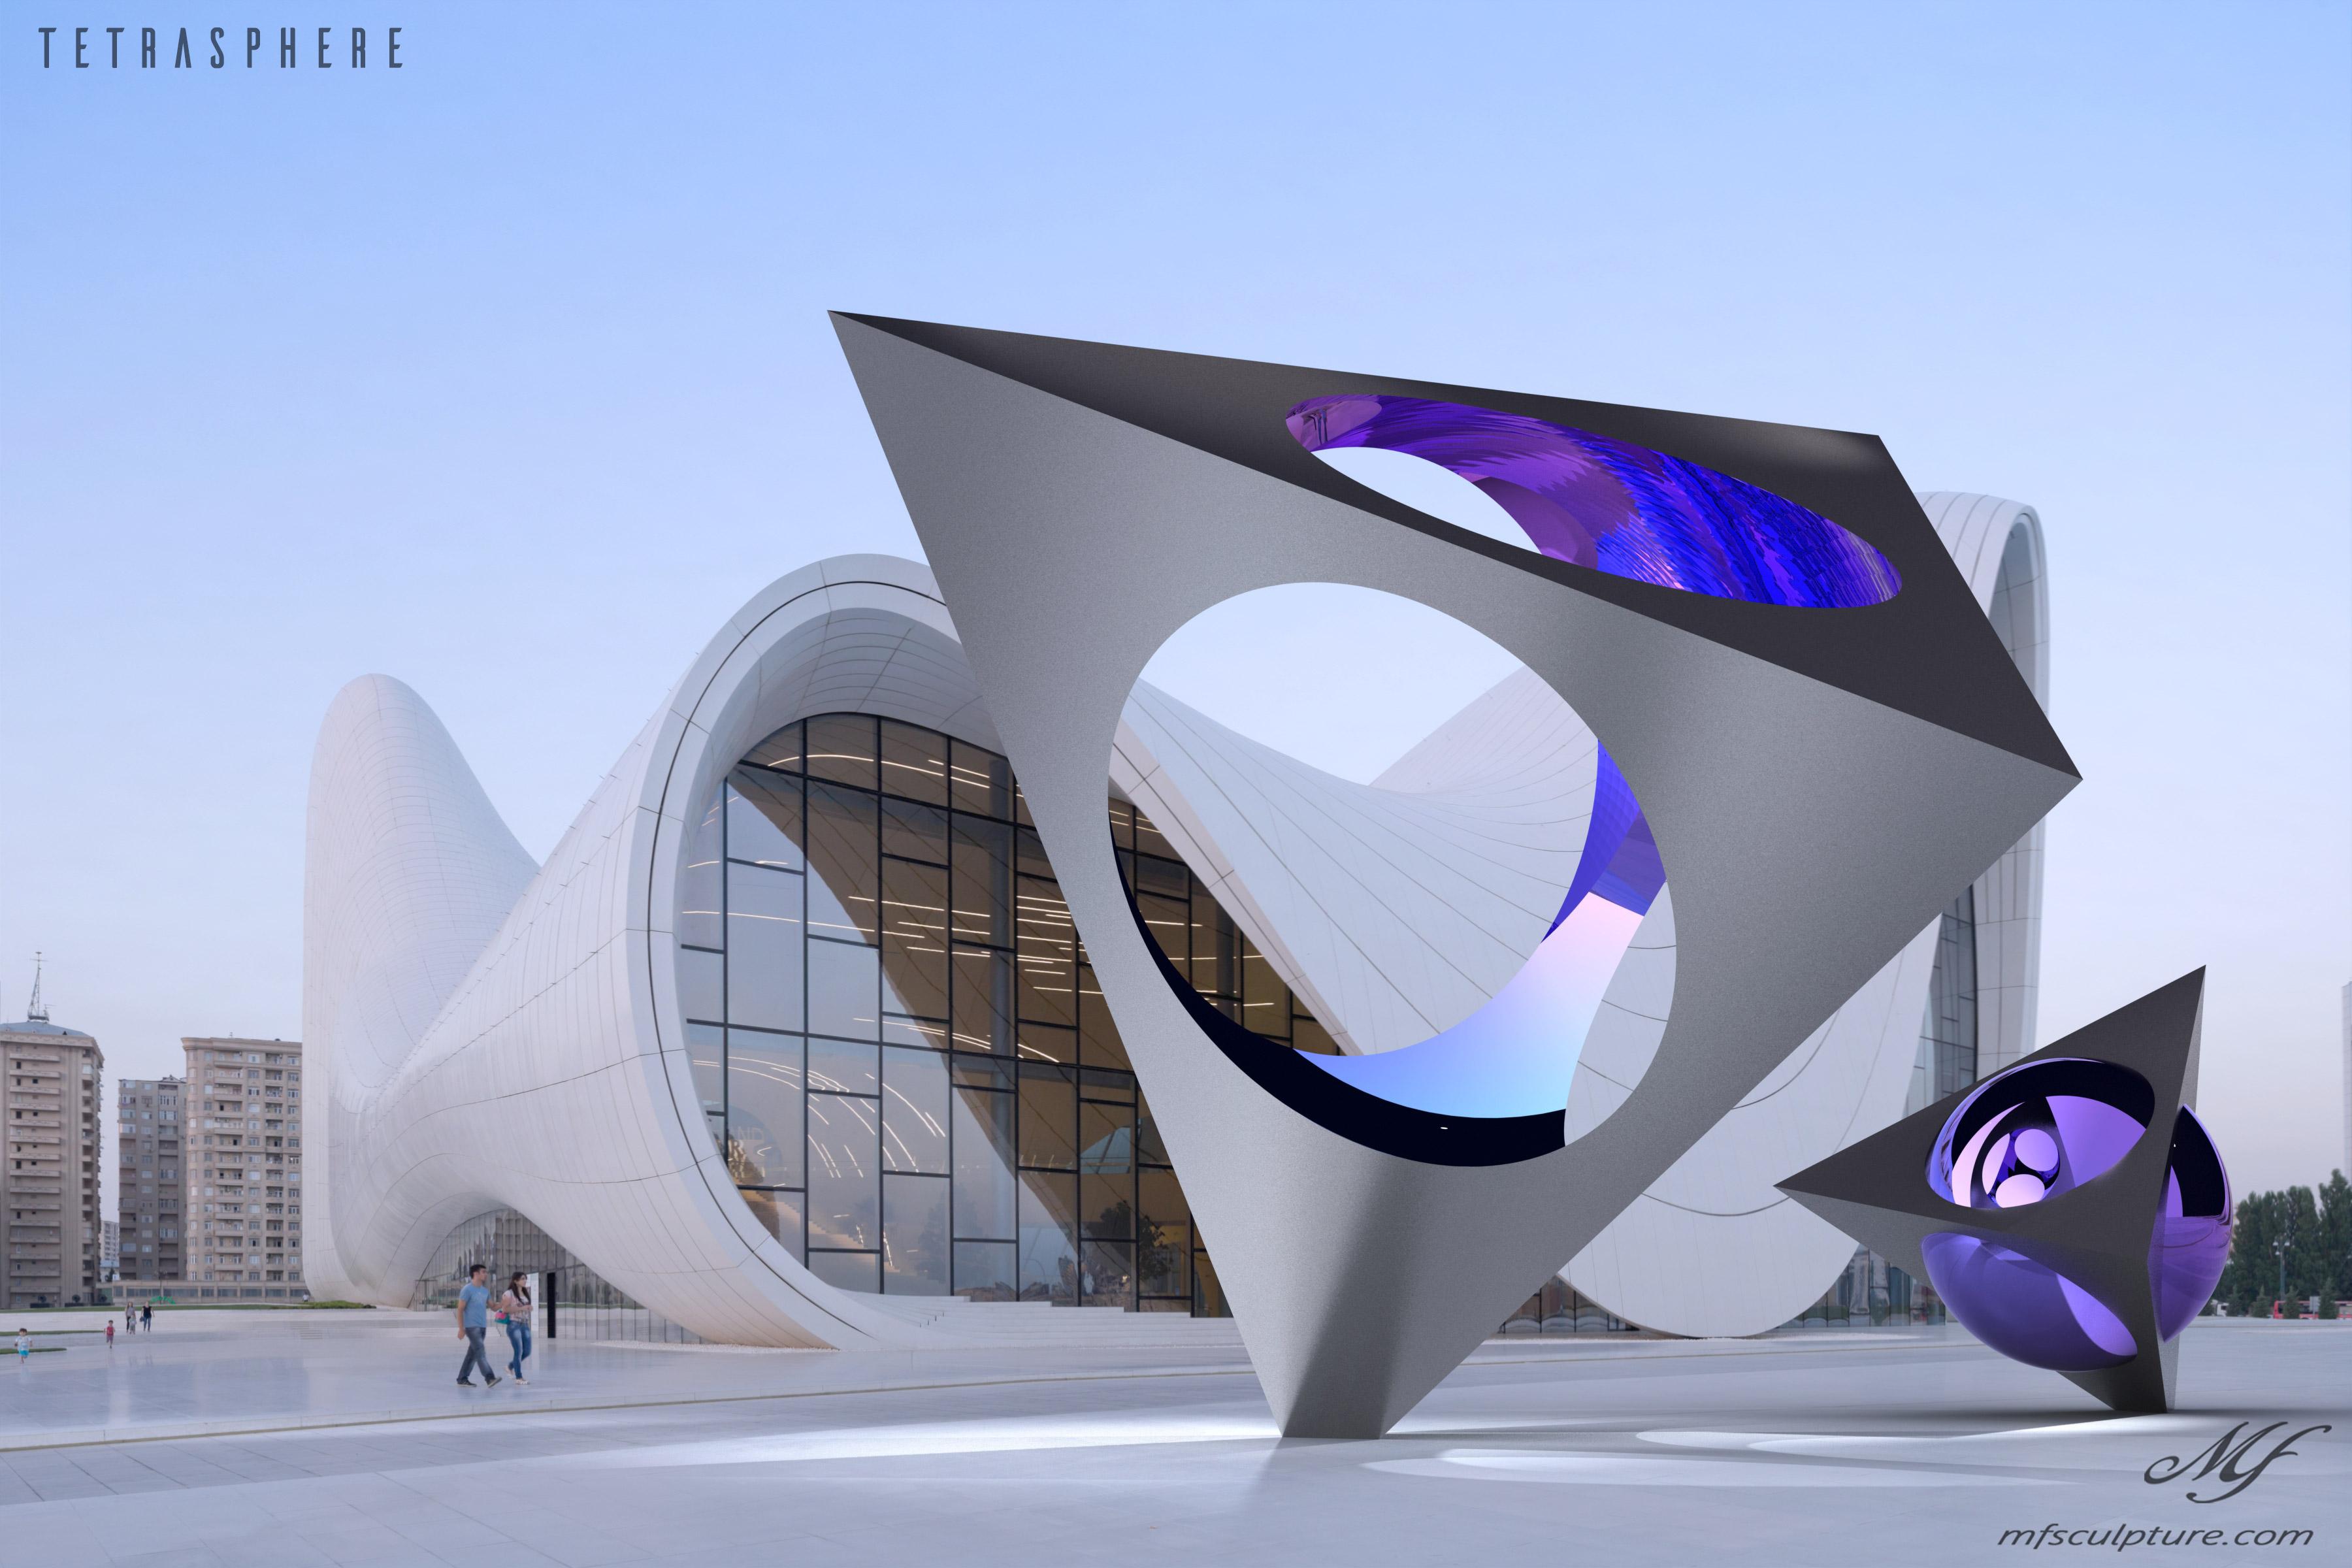 Heydar Aliyev Zaha Hadid Modern Sculpture Tetrasphere 1